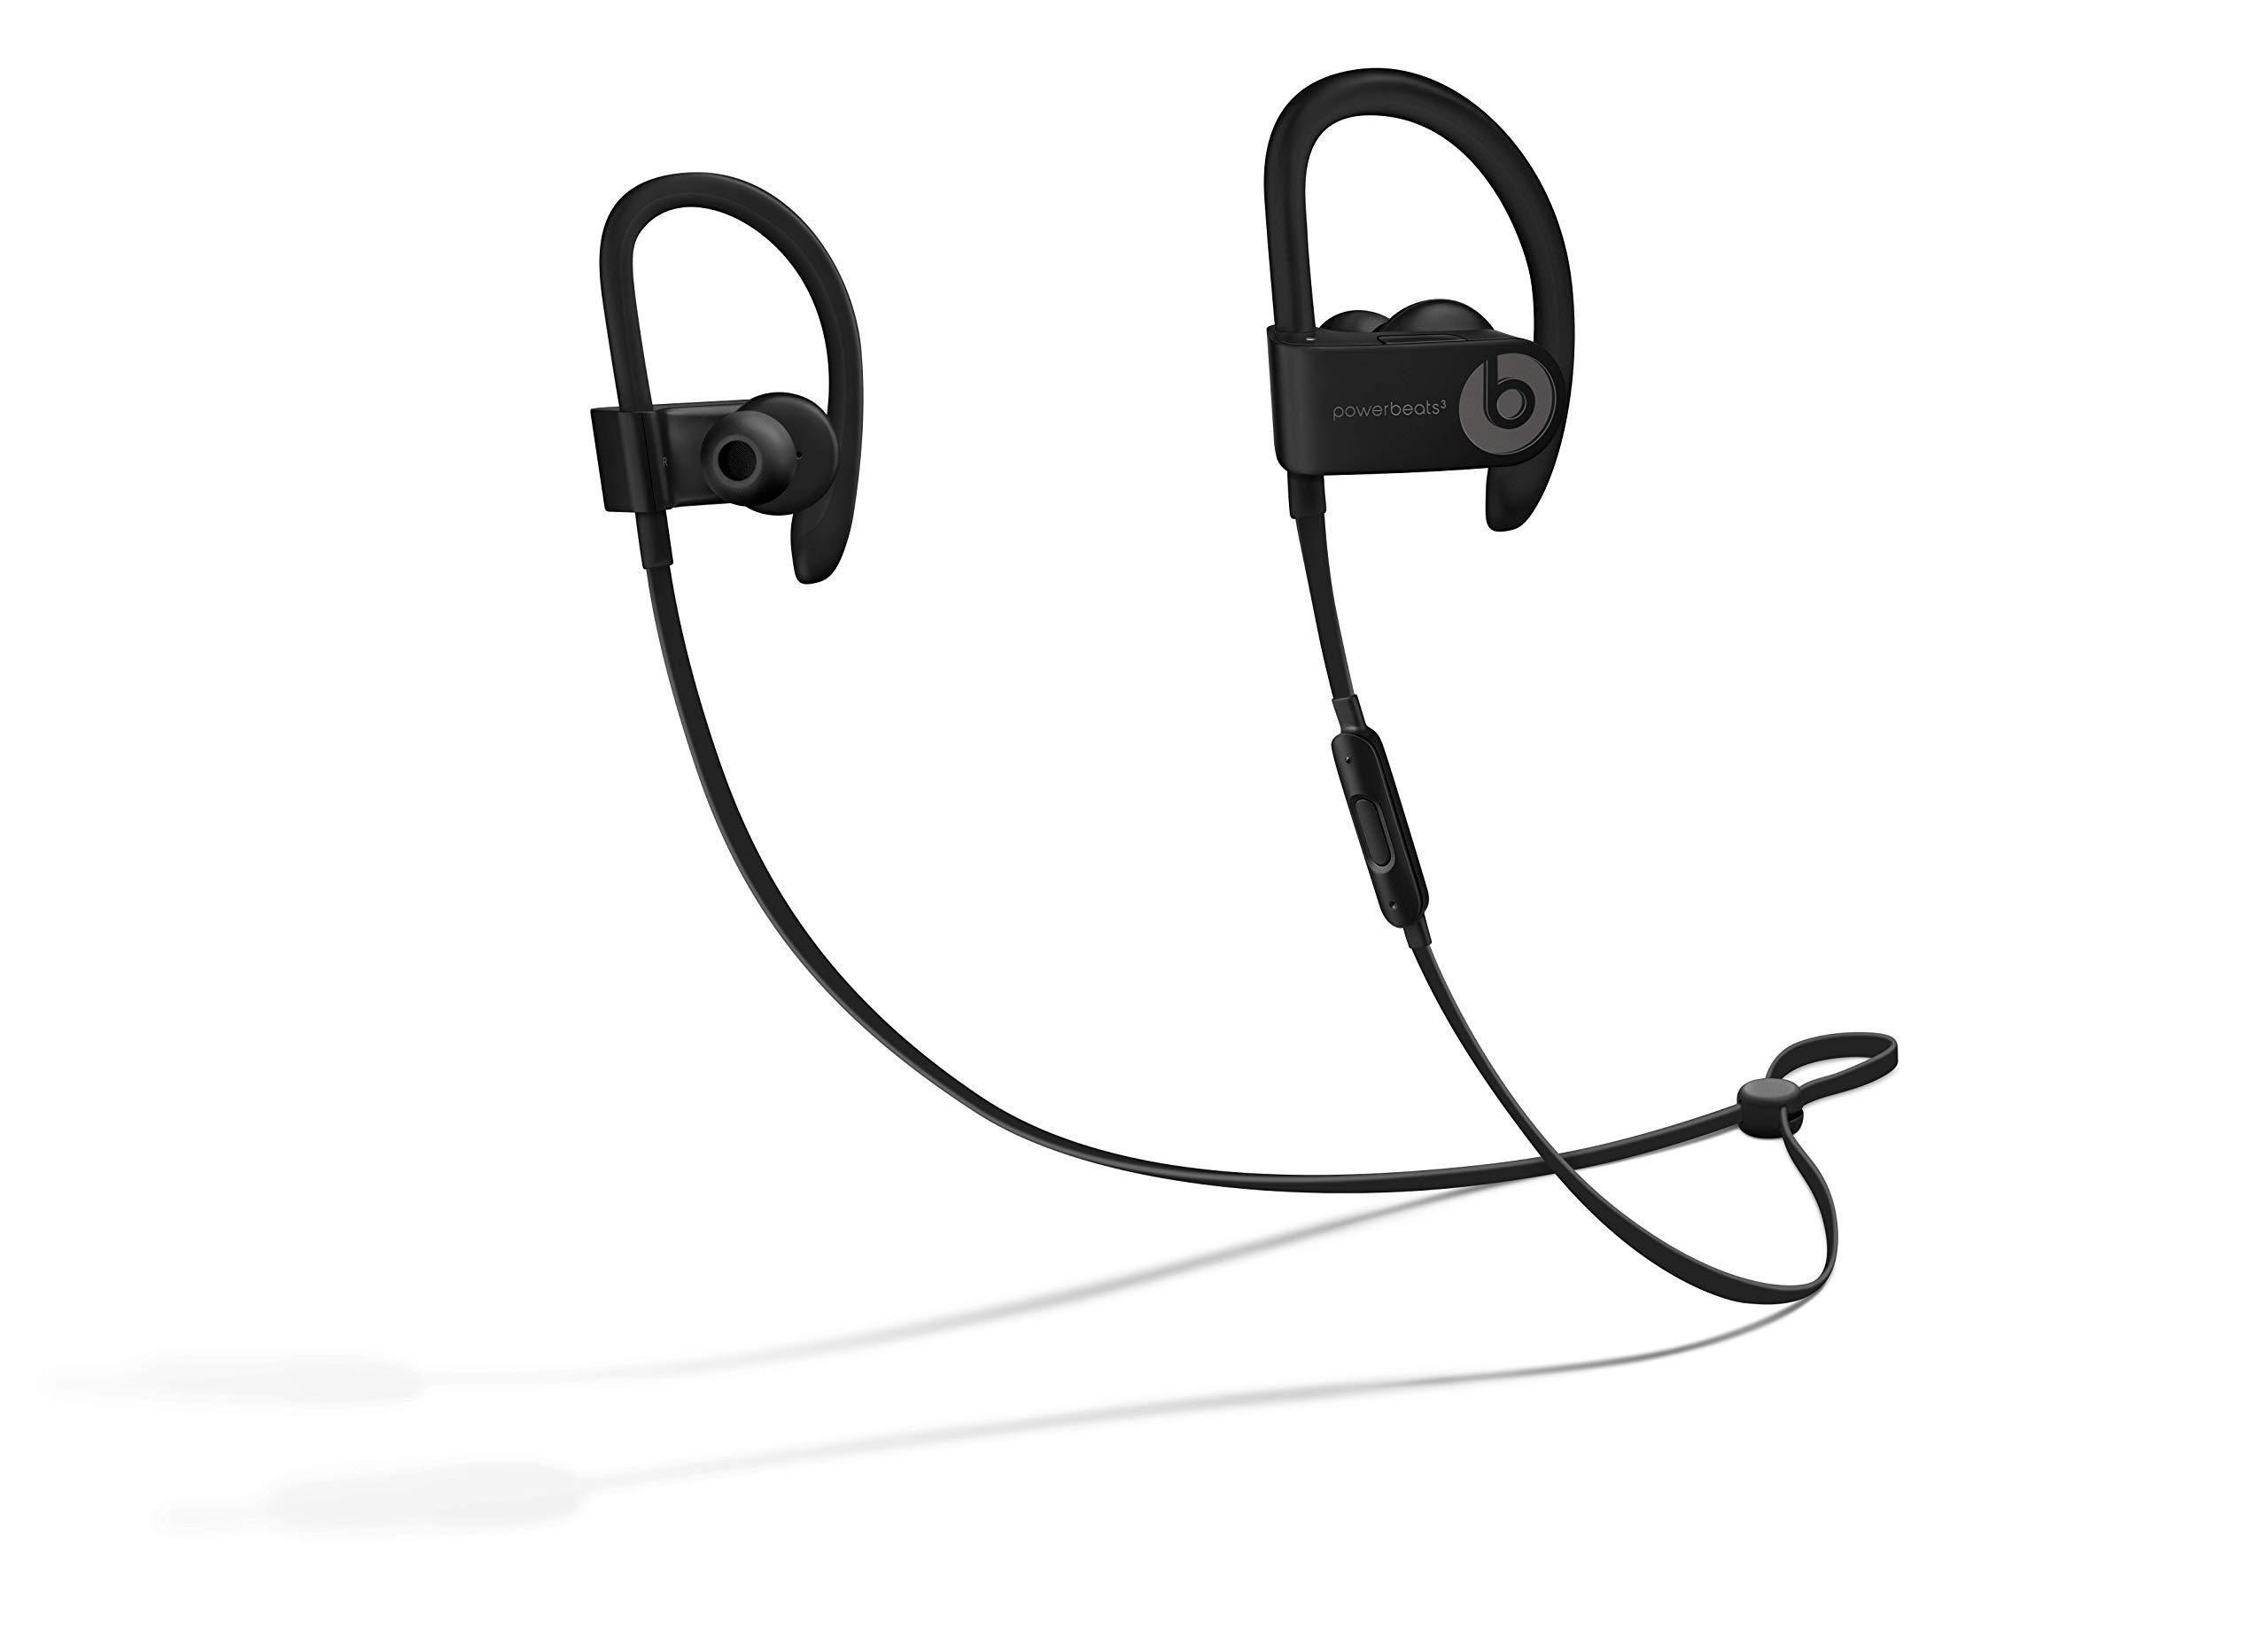 Beats ML8V2LL Powerbeats3 Wireless Earphones